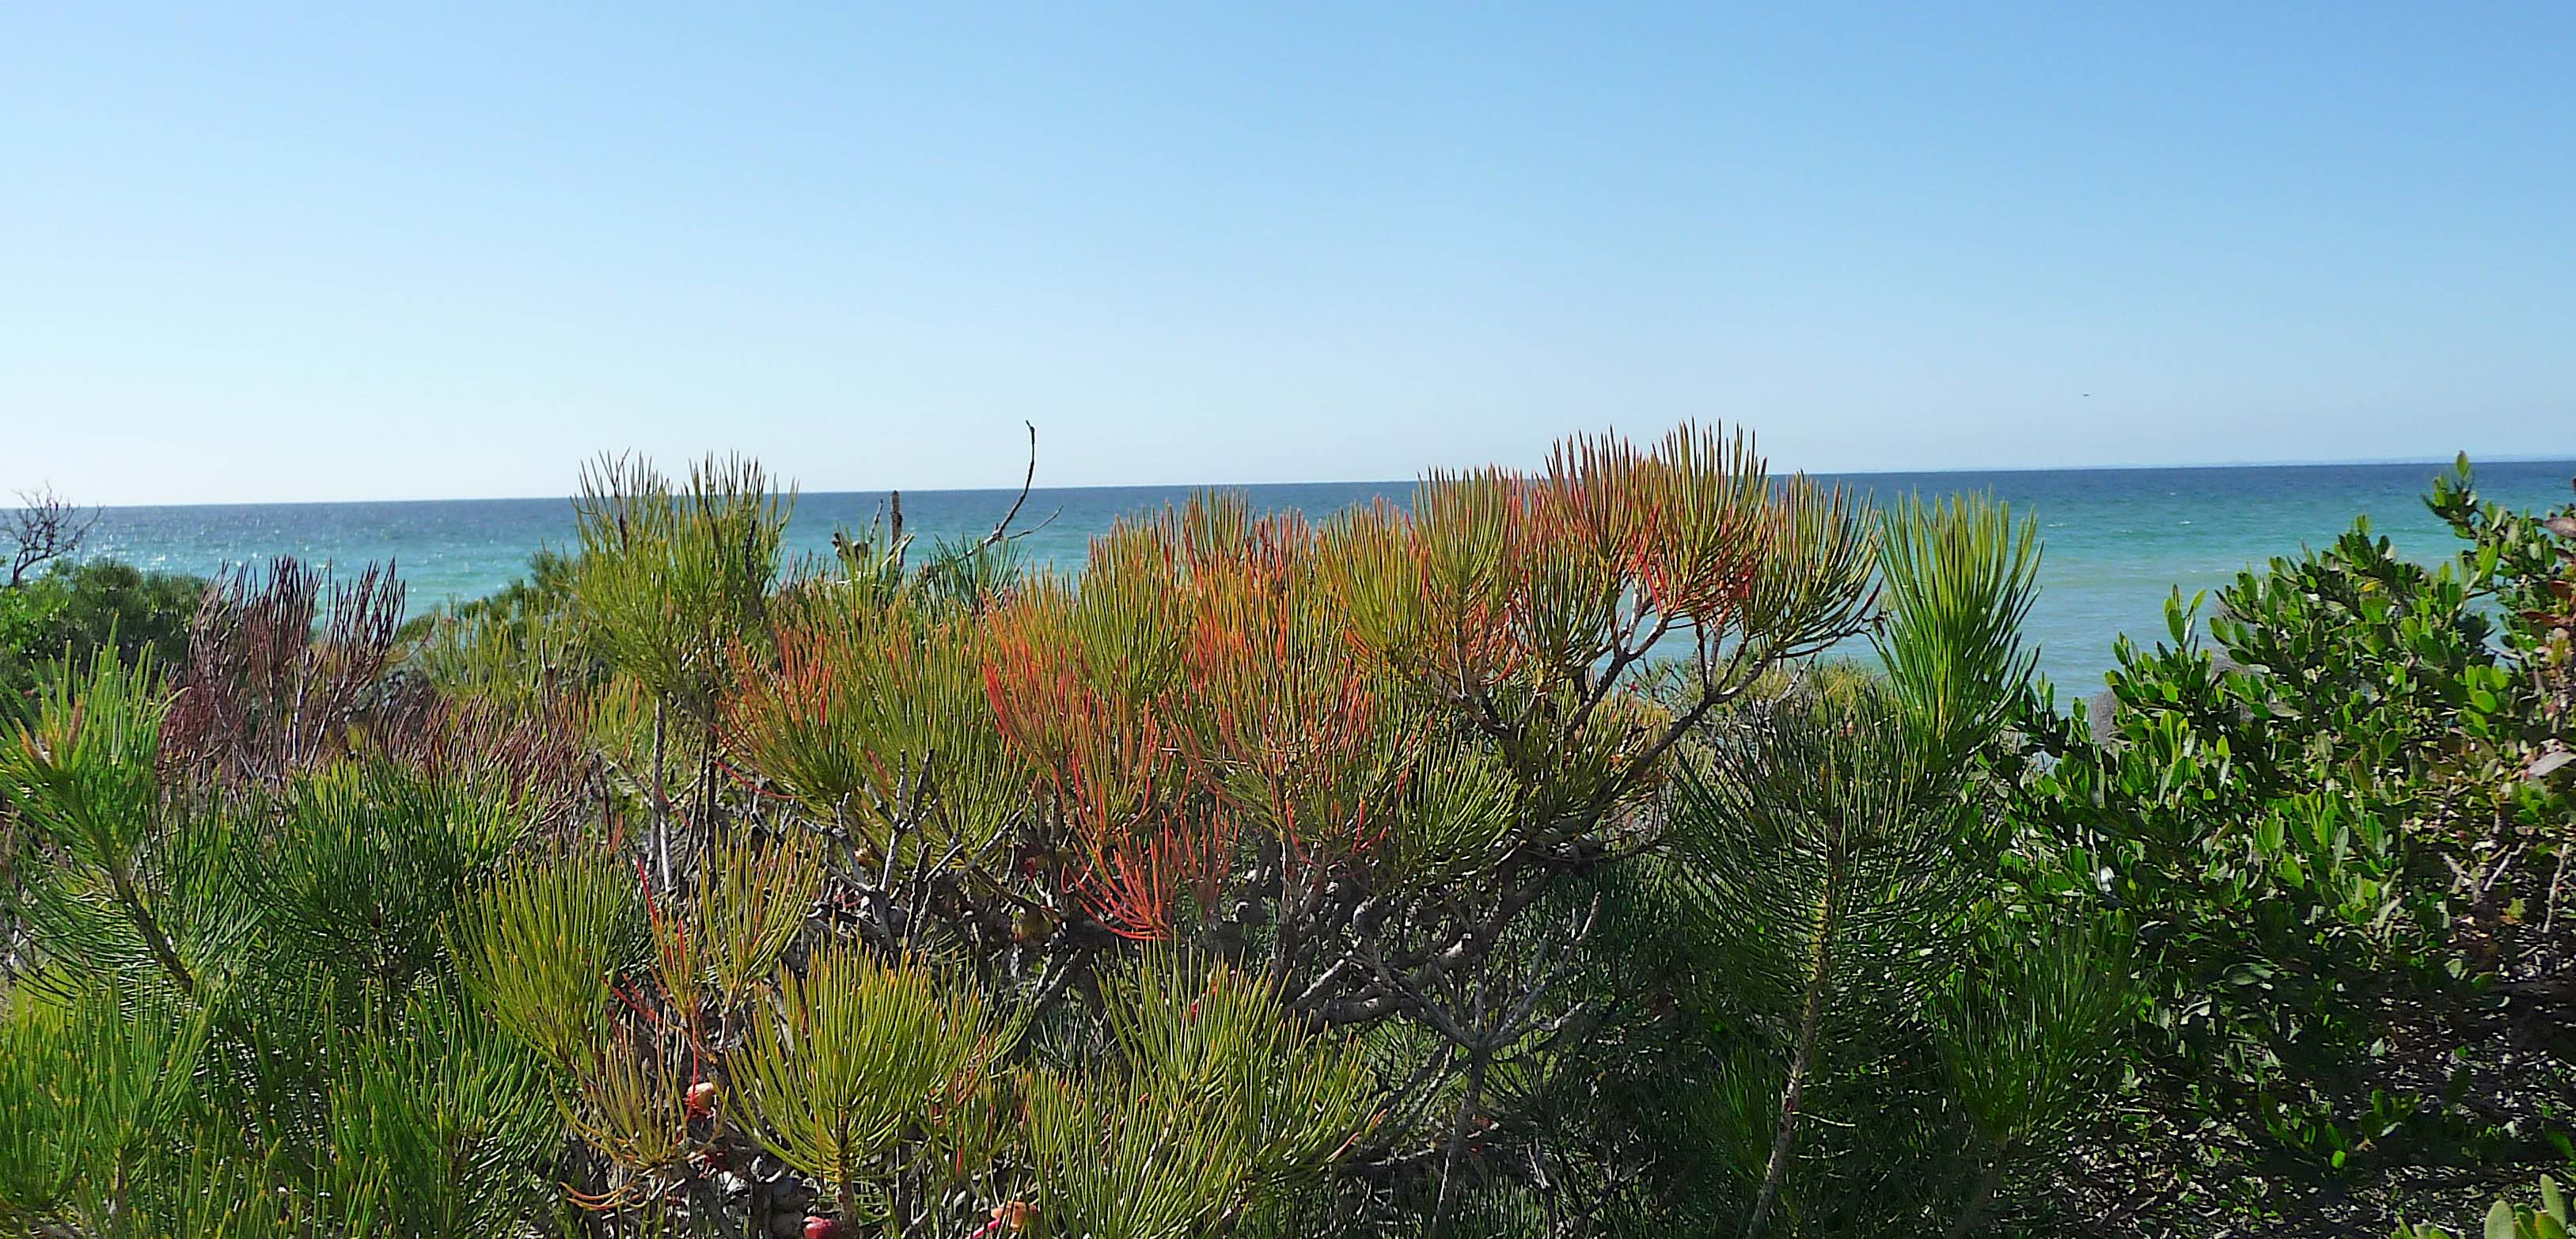 14.Geographe Bay